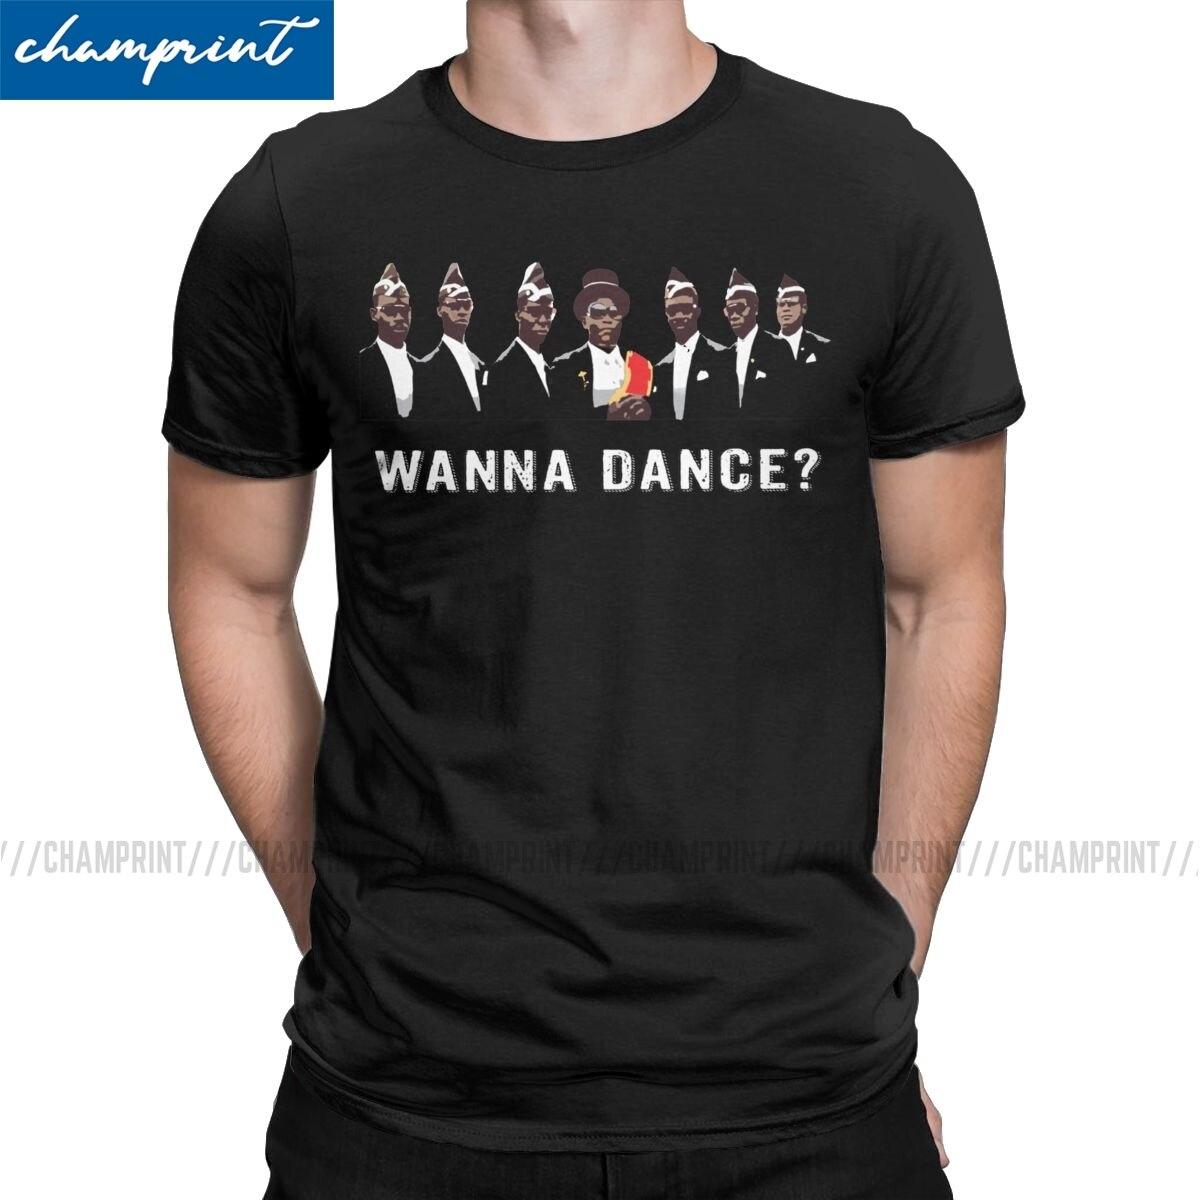 Ghana Funeral Dance Team T-Shirts Men Coffin Dance T Shirt 2020 Funny Meme Funeral Dance Ghana Dancing Pallbearers Clothing